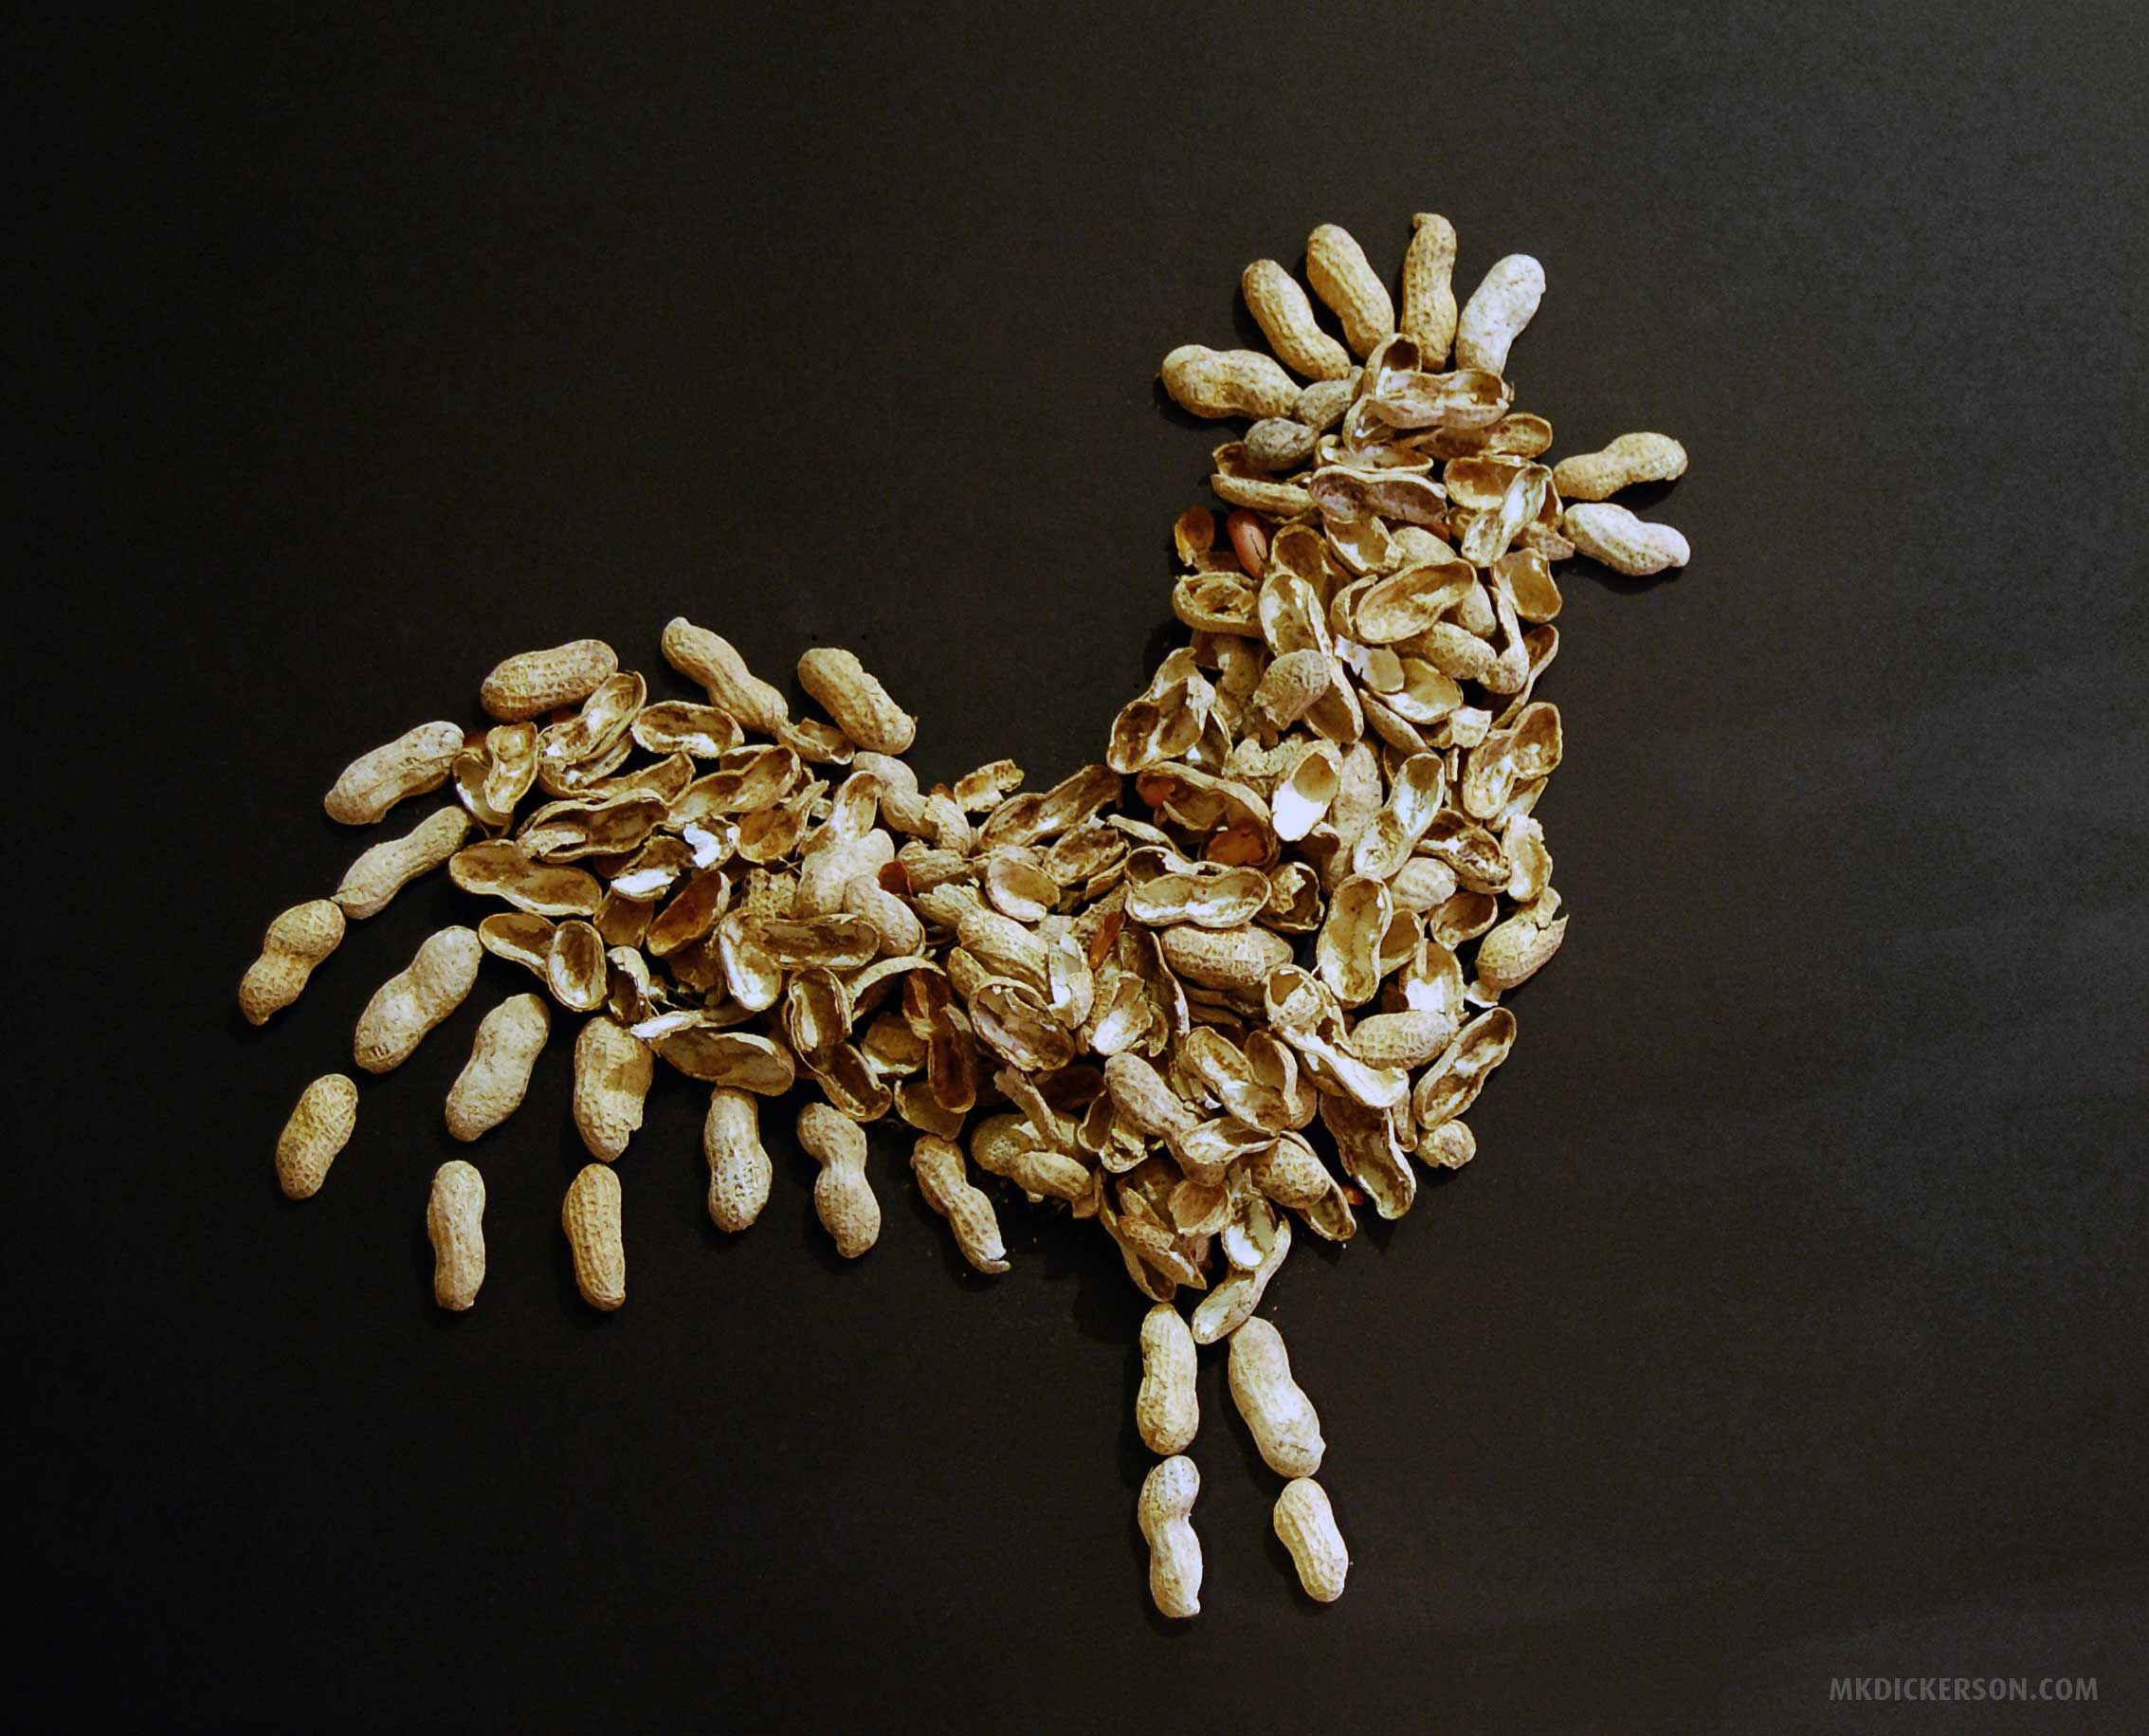 Rodeo Night Bird Made From Peanut Shells At The Art